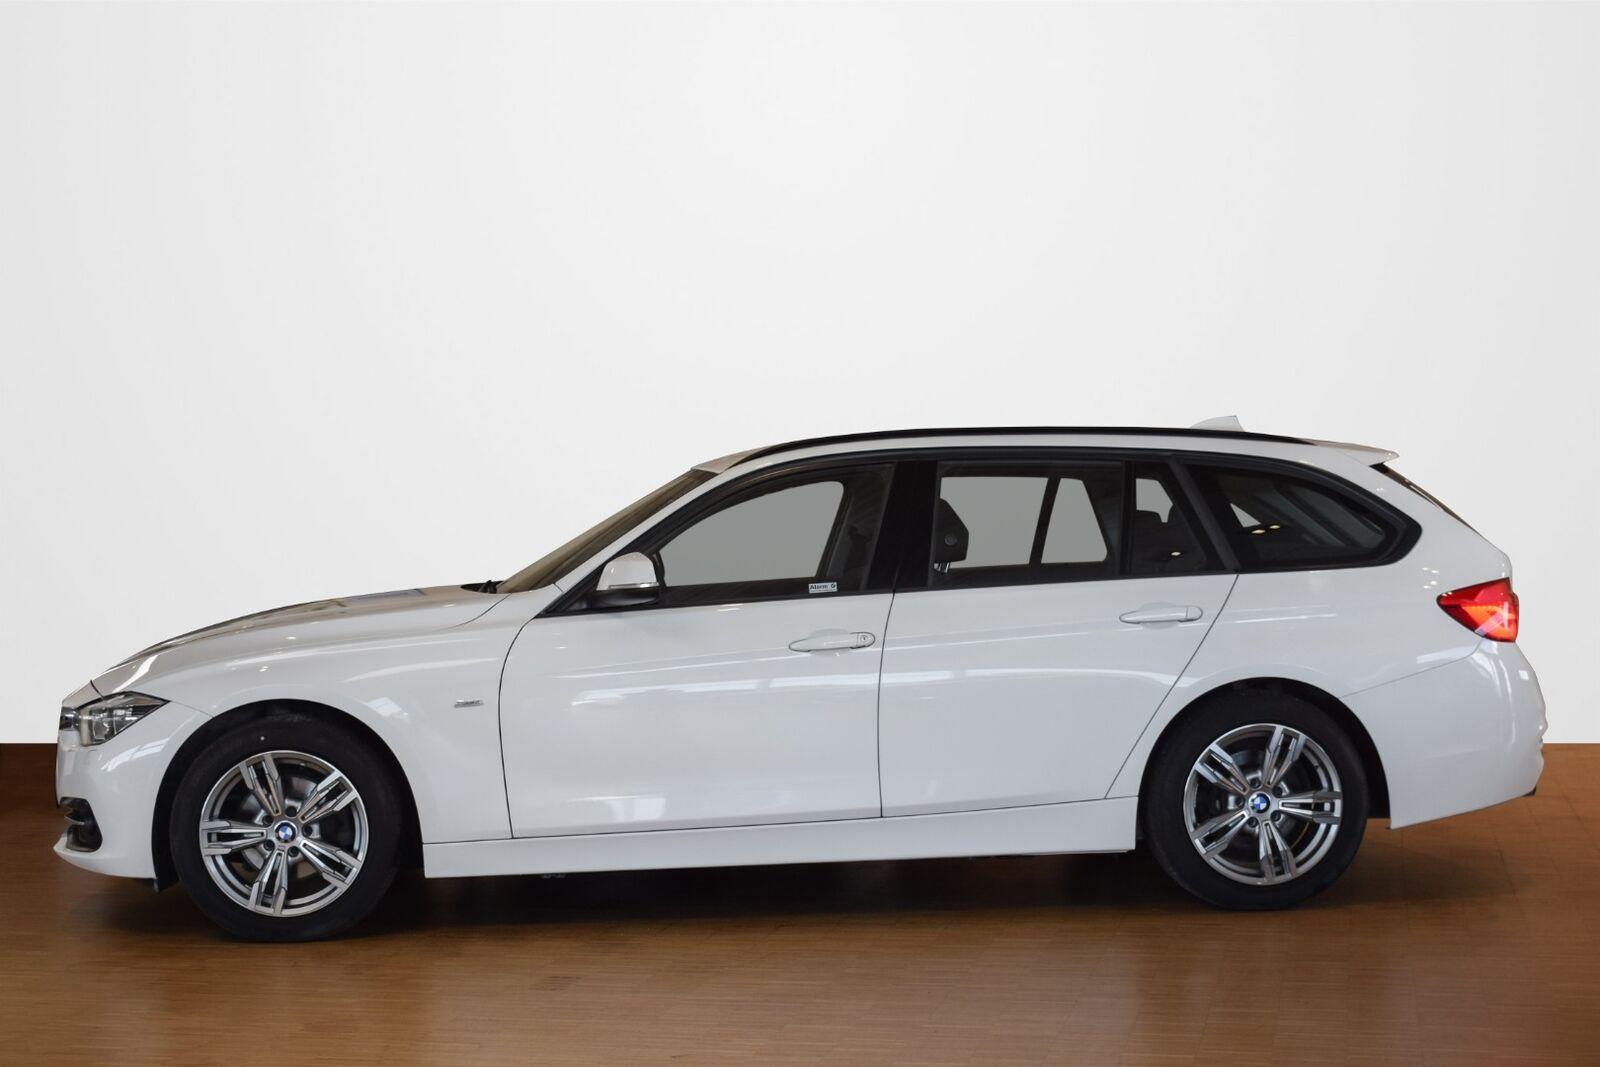 BMW 320d 2,0 Touring Sport Line xDrive aut. - billede 1